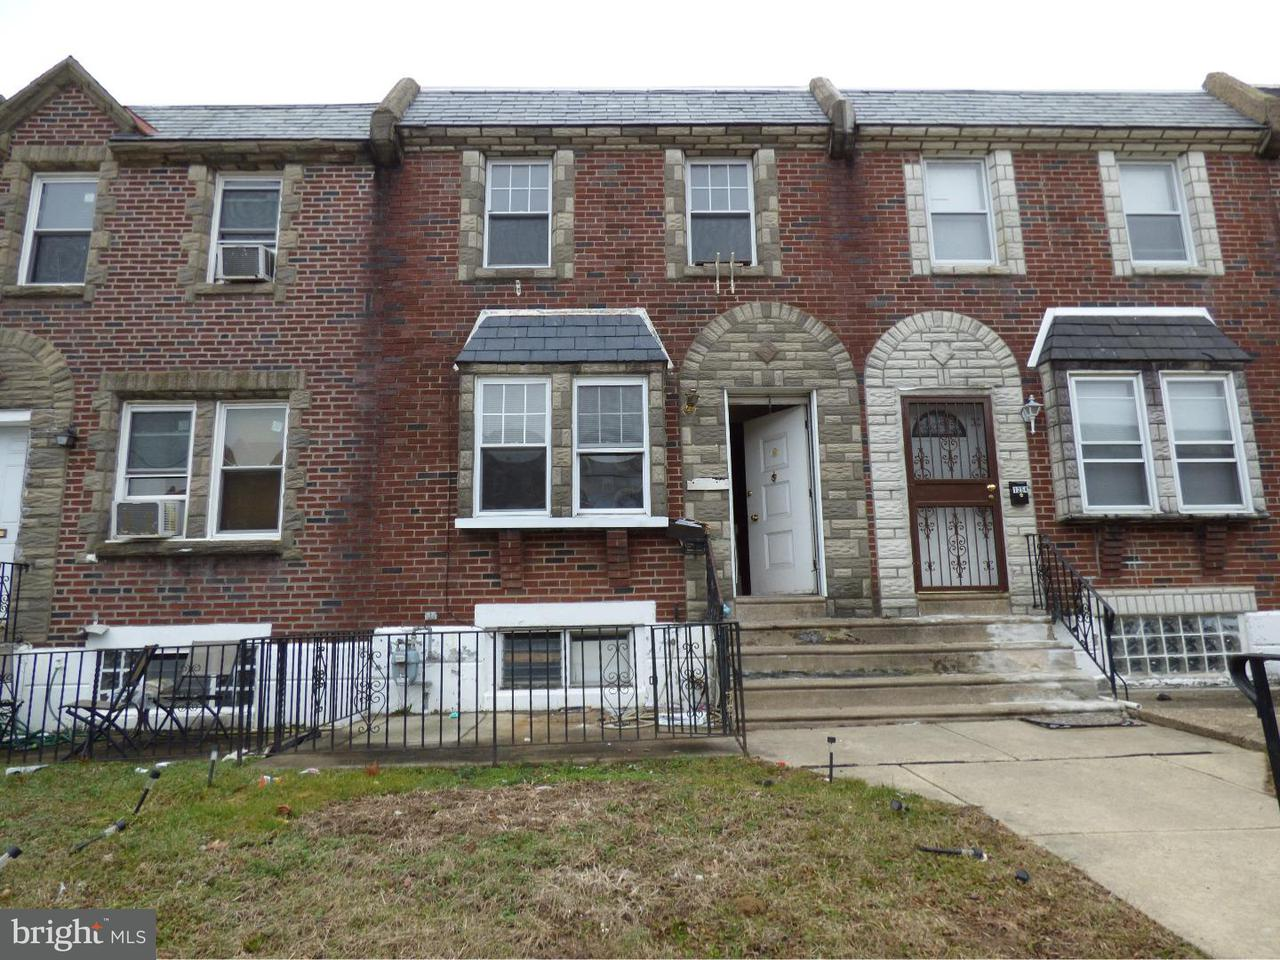 1256  Greeby Philadelphia, PA 19111